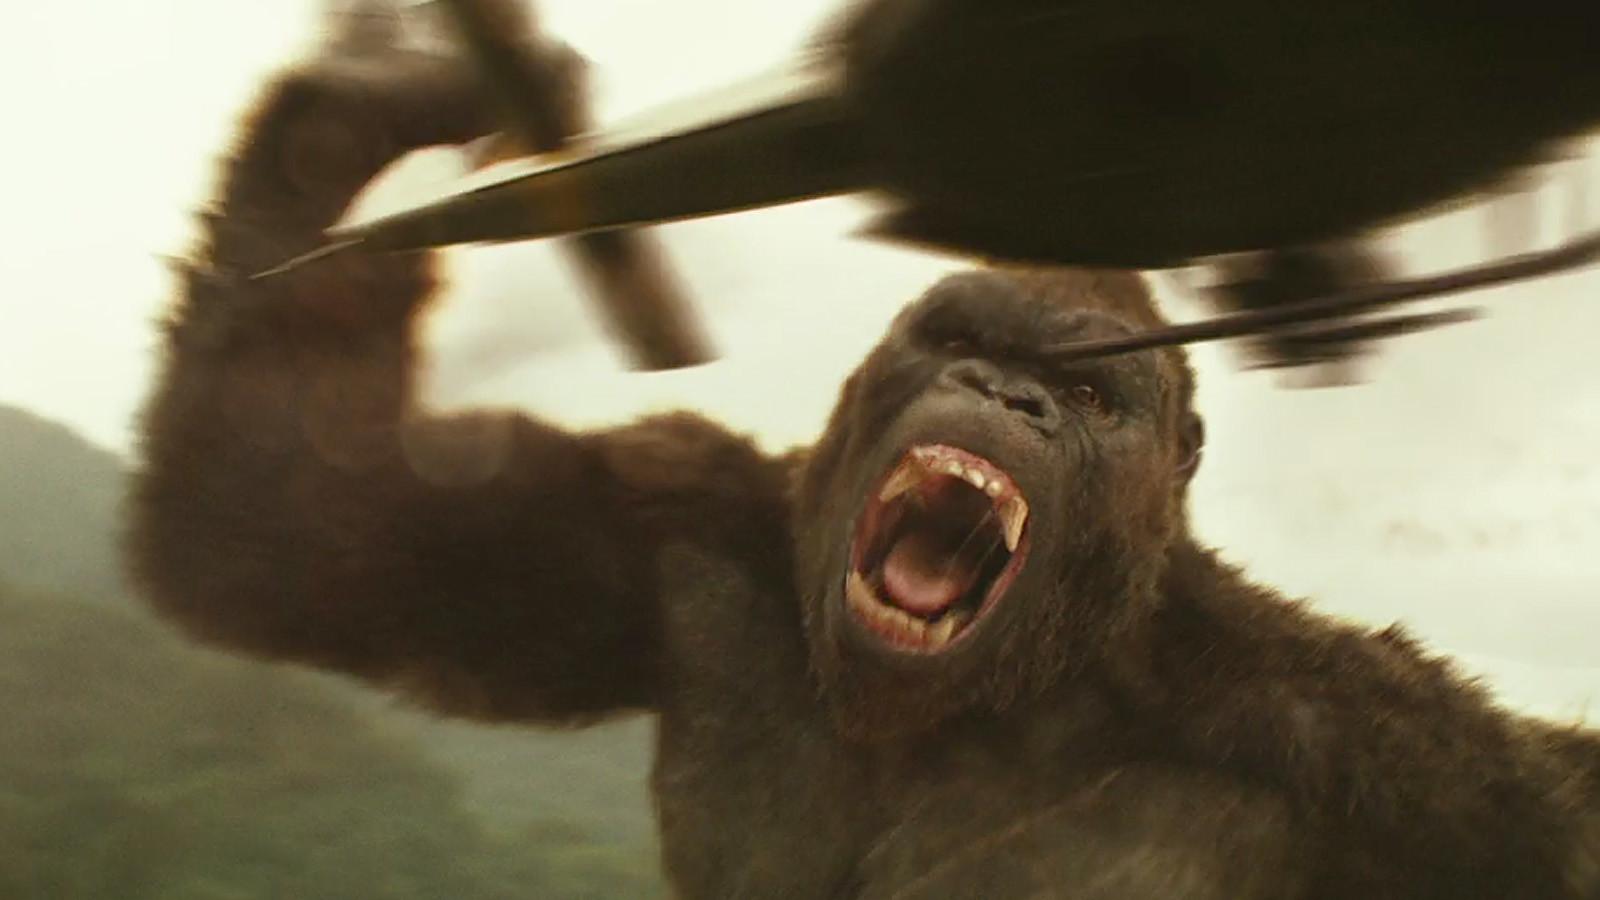 'Kong: Skull Island' trailer